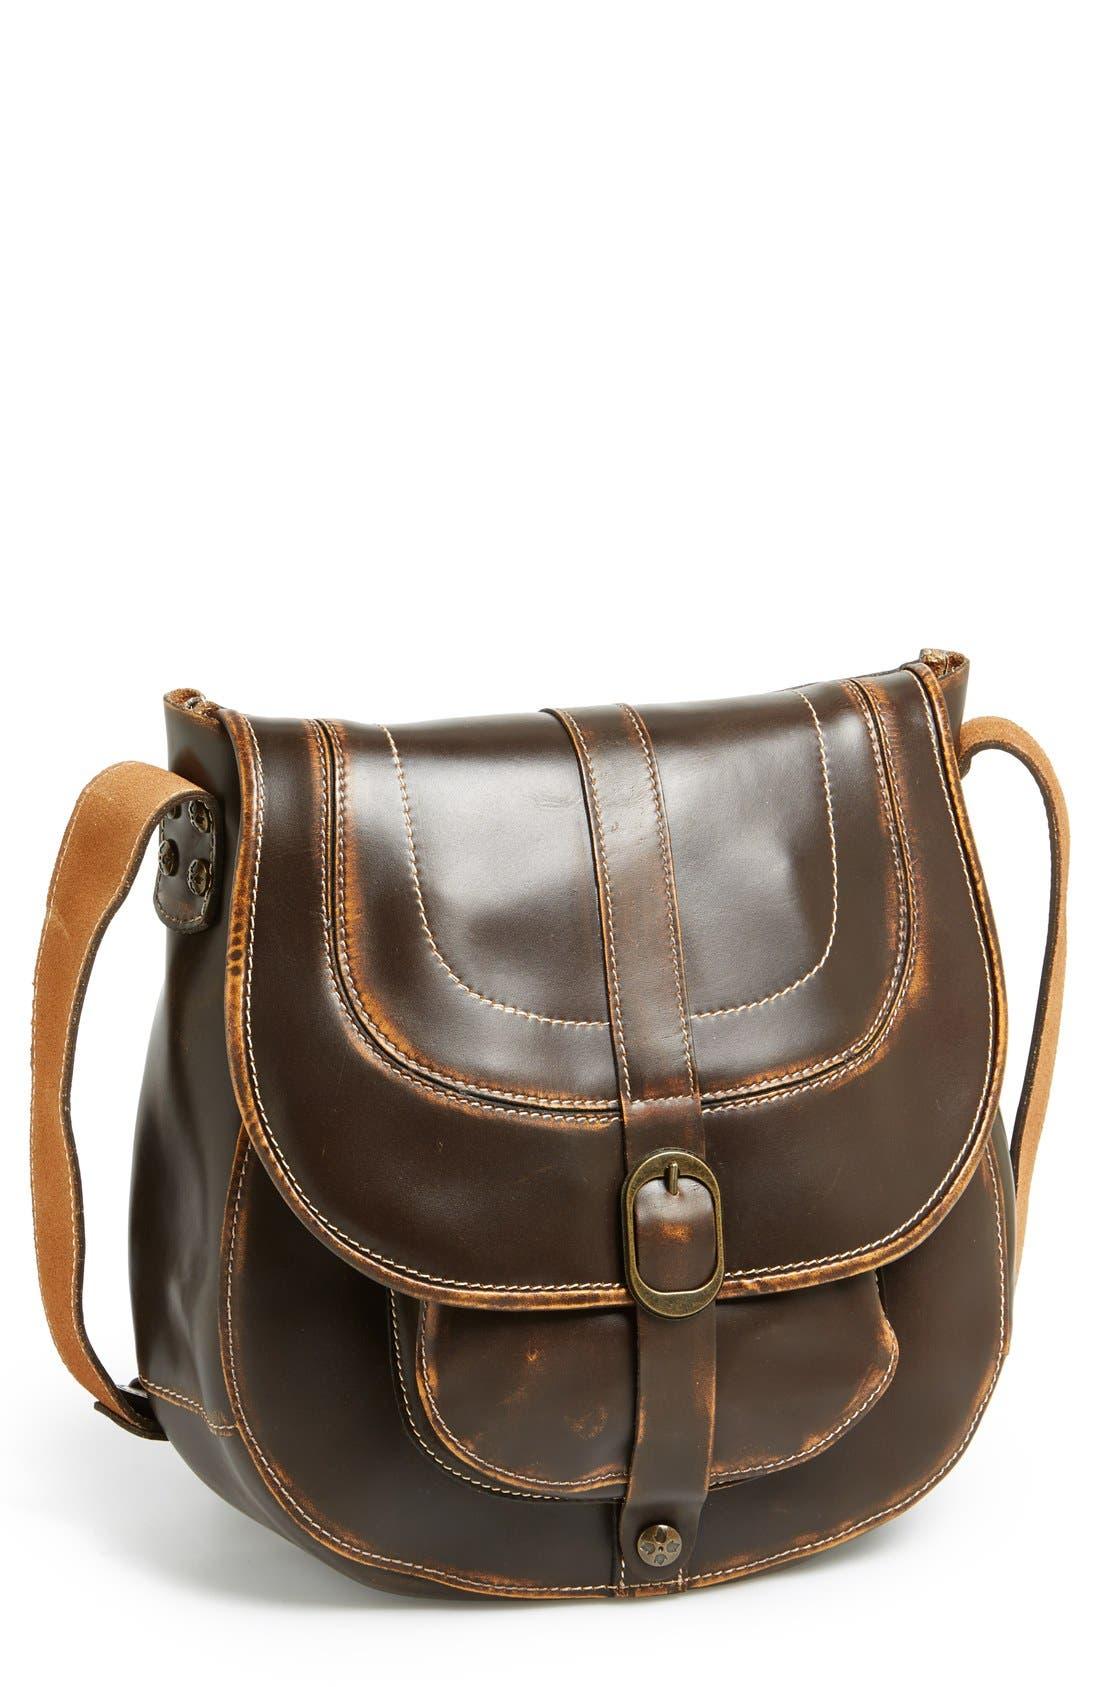 Alternate Image 1 Selected - Patricia Nash 'Barcellona' Leather Crossbody Bag